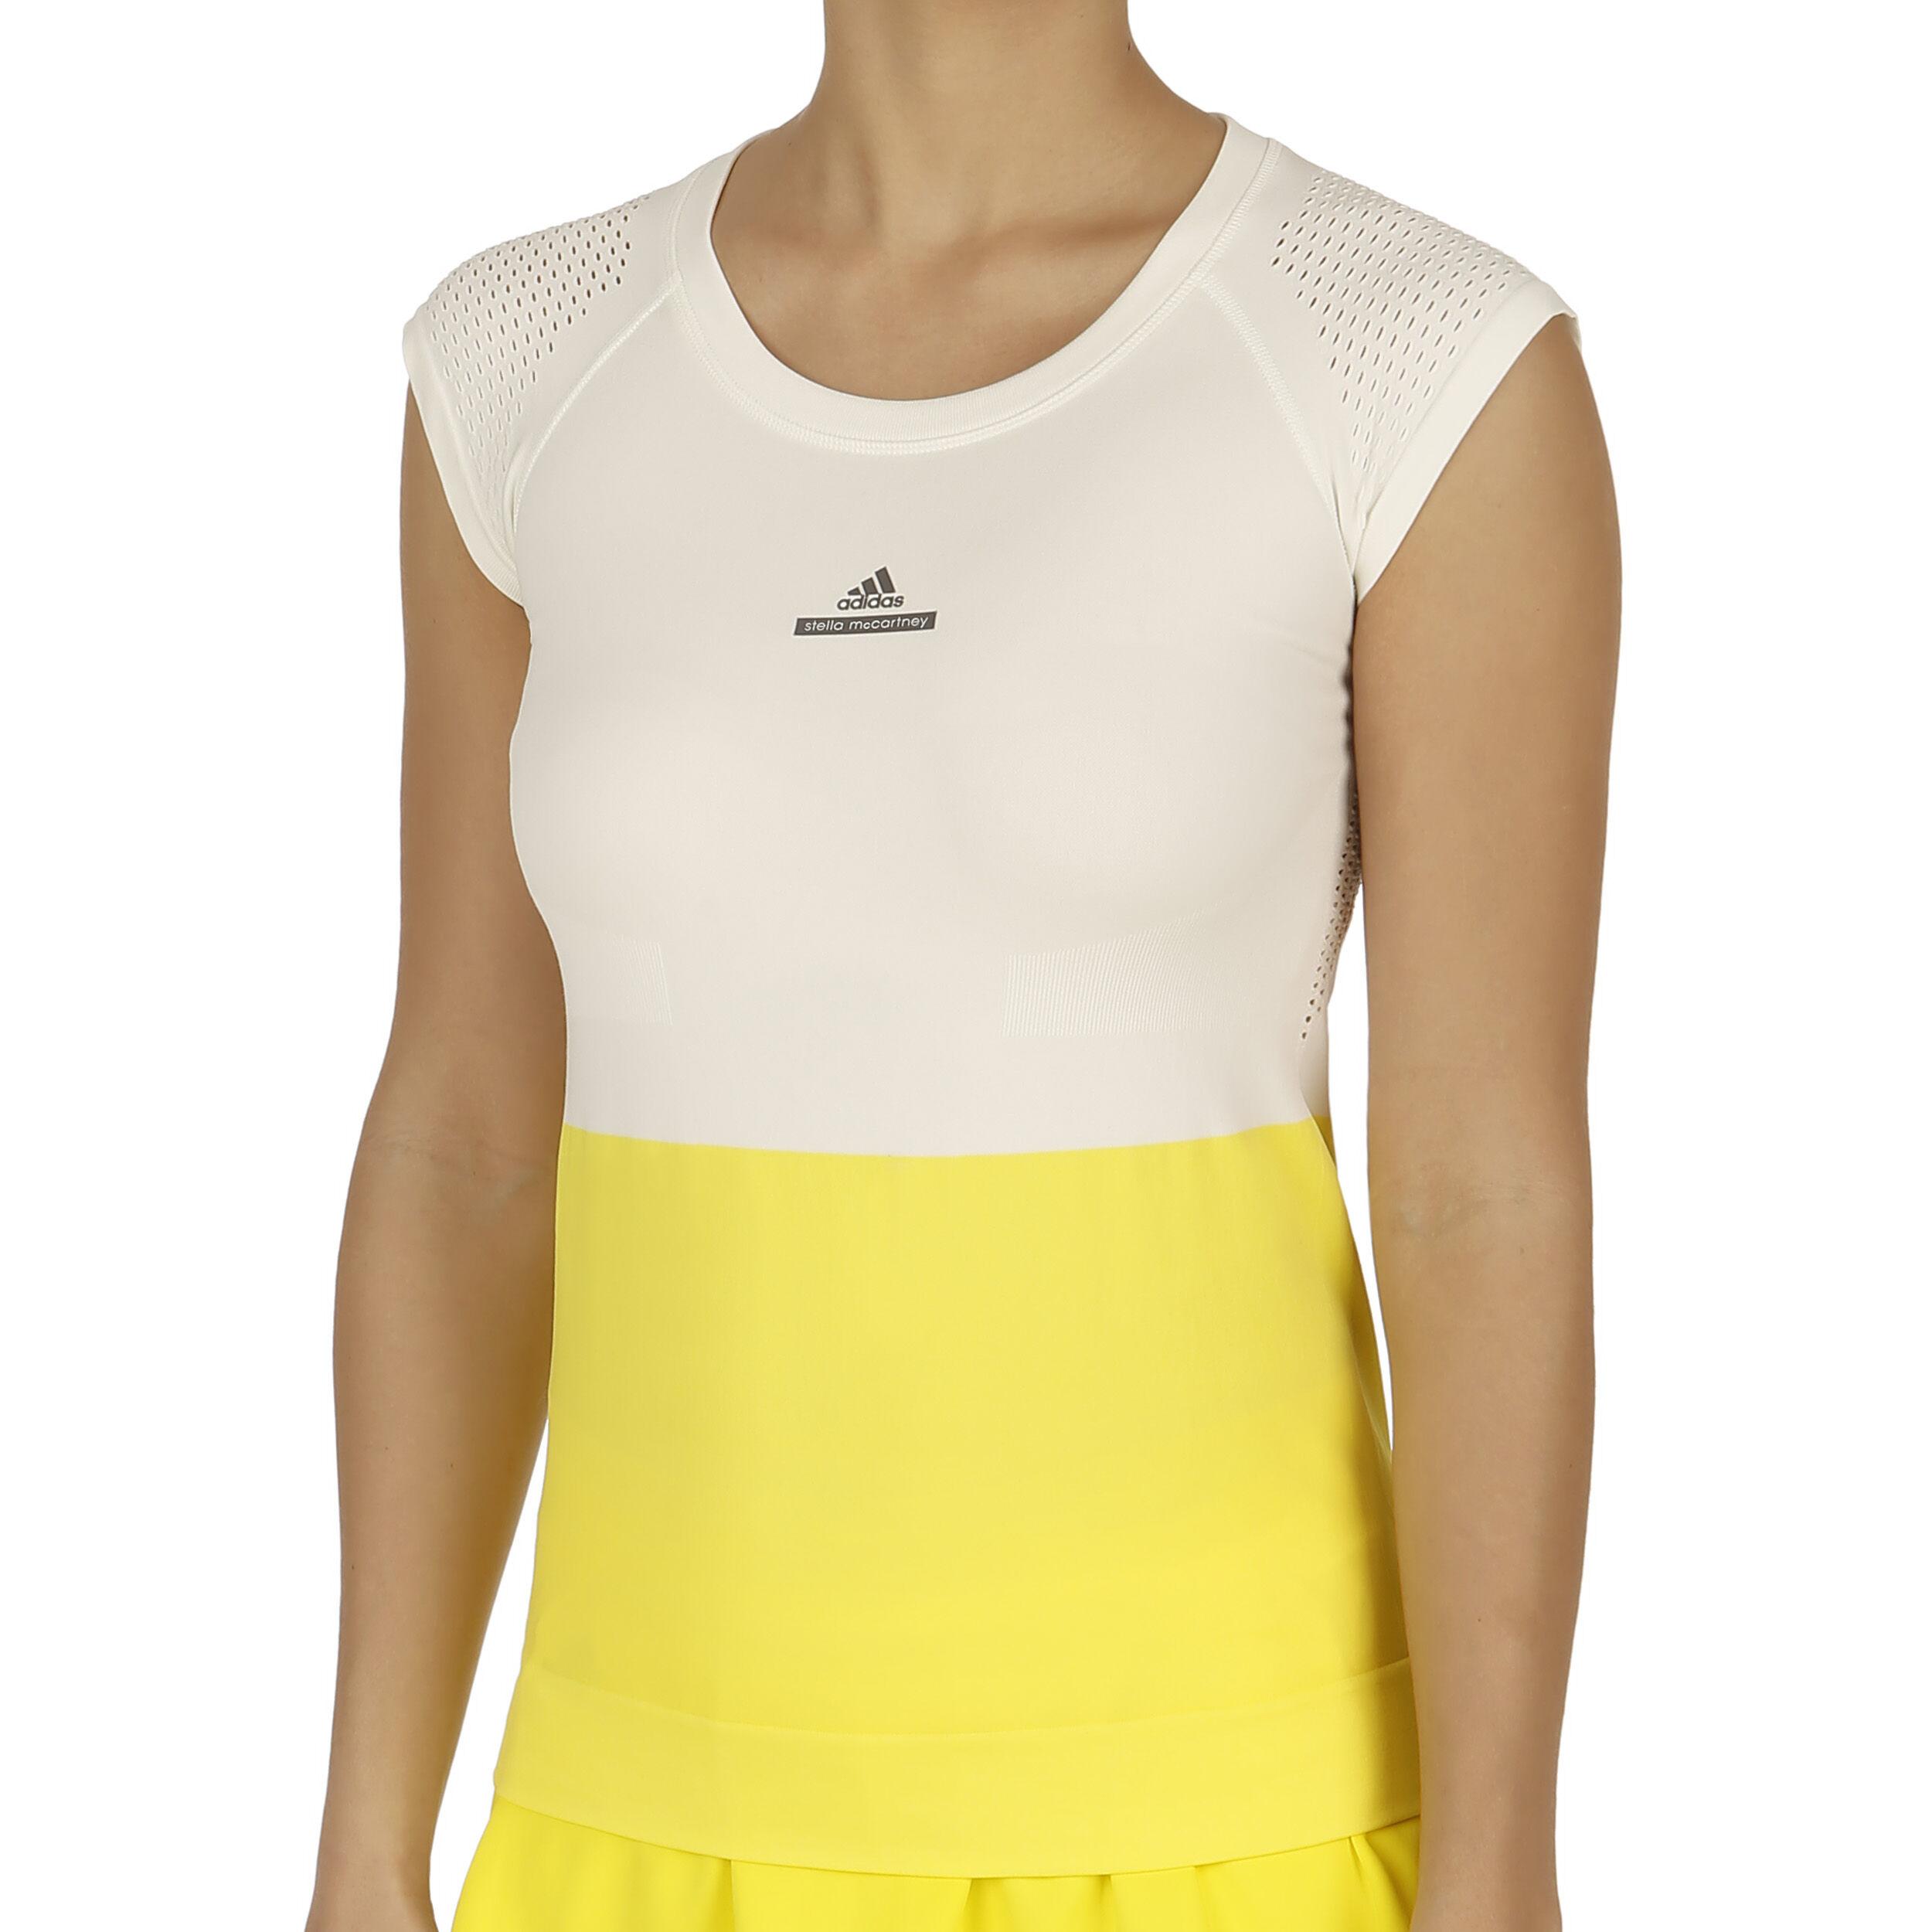 Tennis Kläder Adidas Dam Stella McCartney Barricade Tee